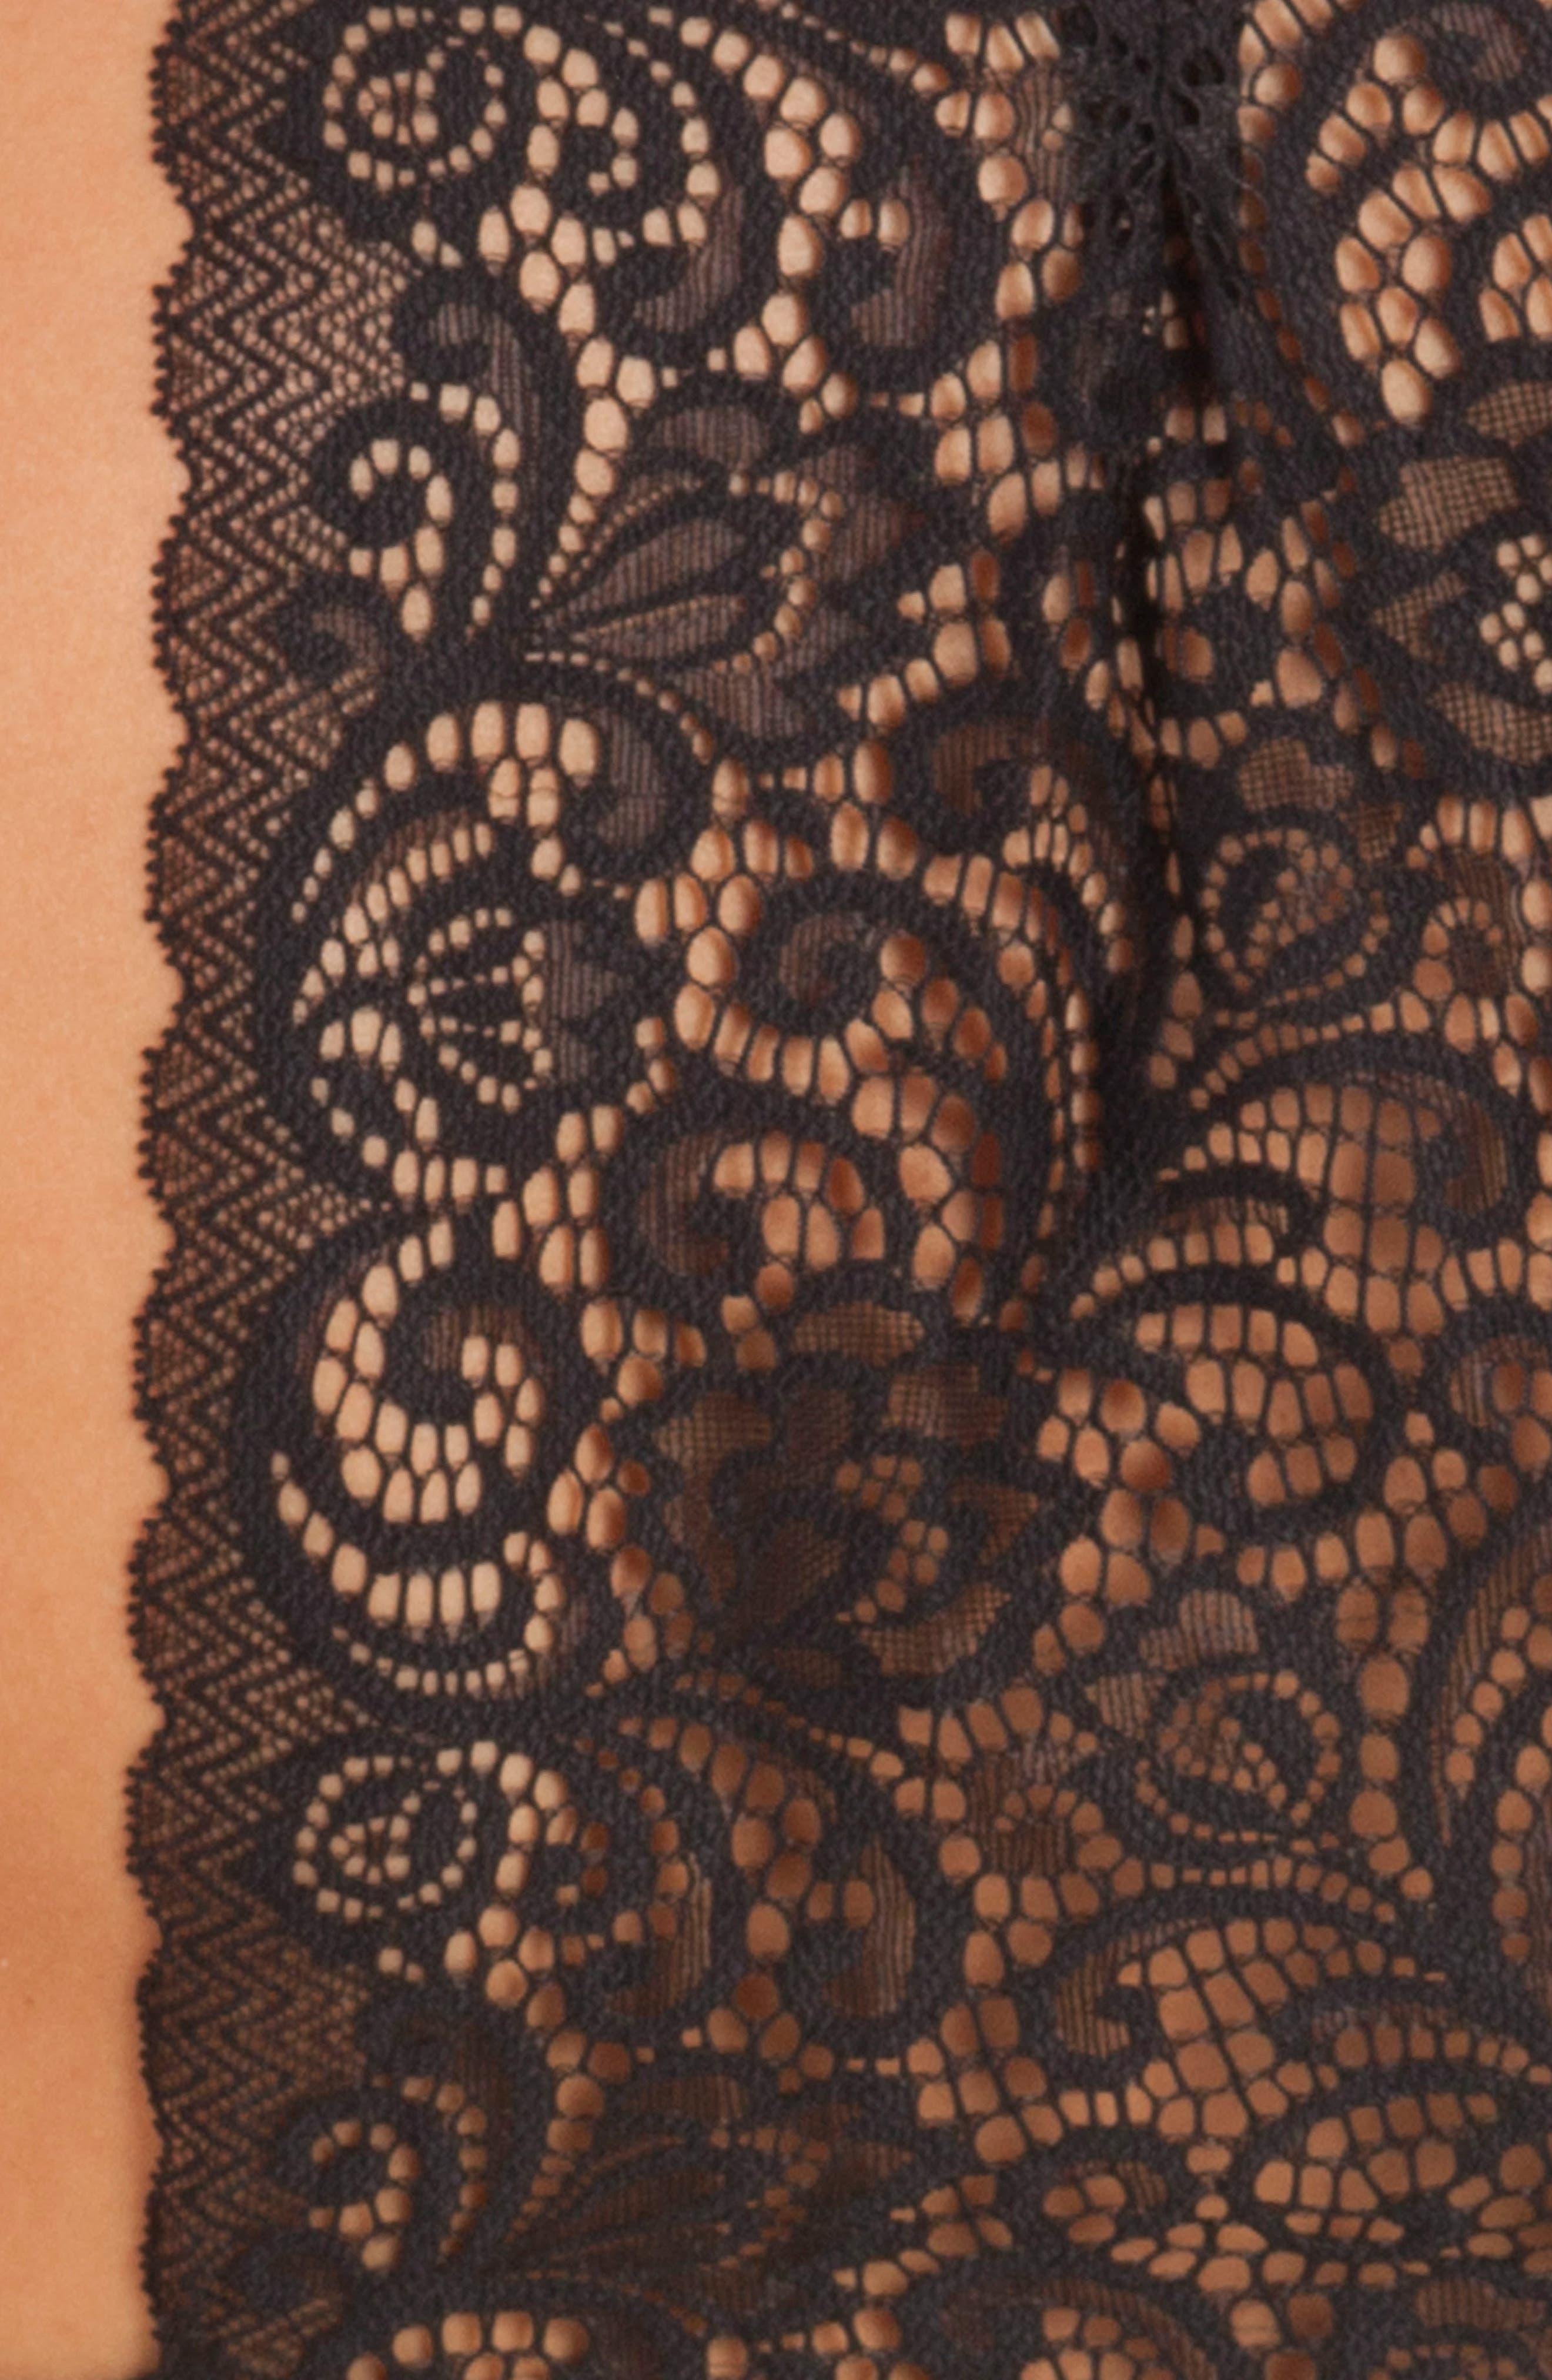 Konya Lace Racerback Camisole,                             Alternate thumbnail 5, color,                             001